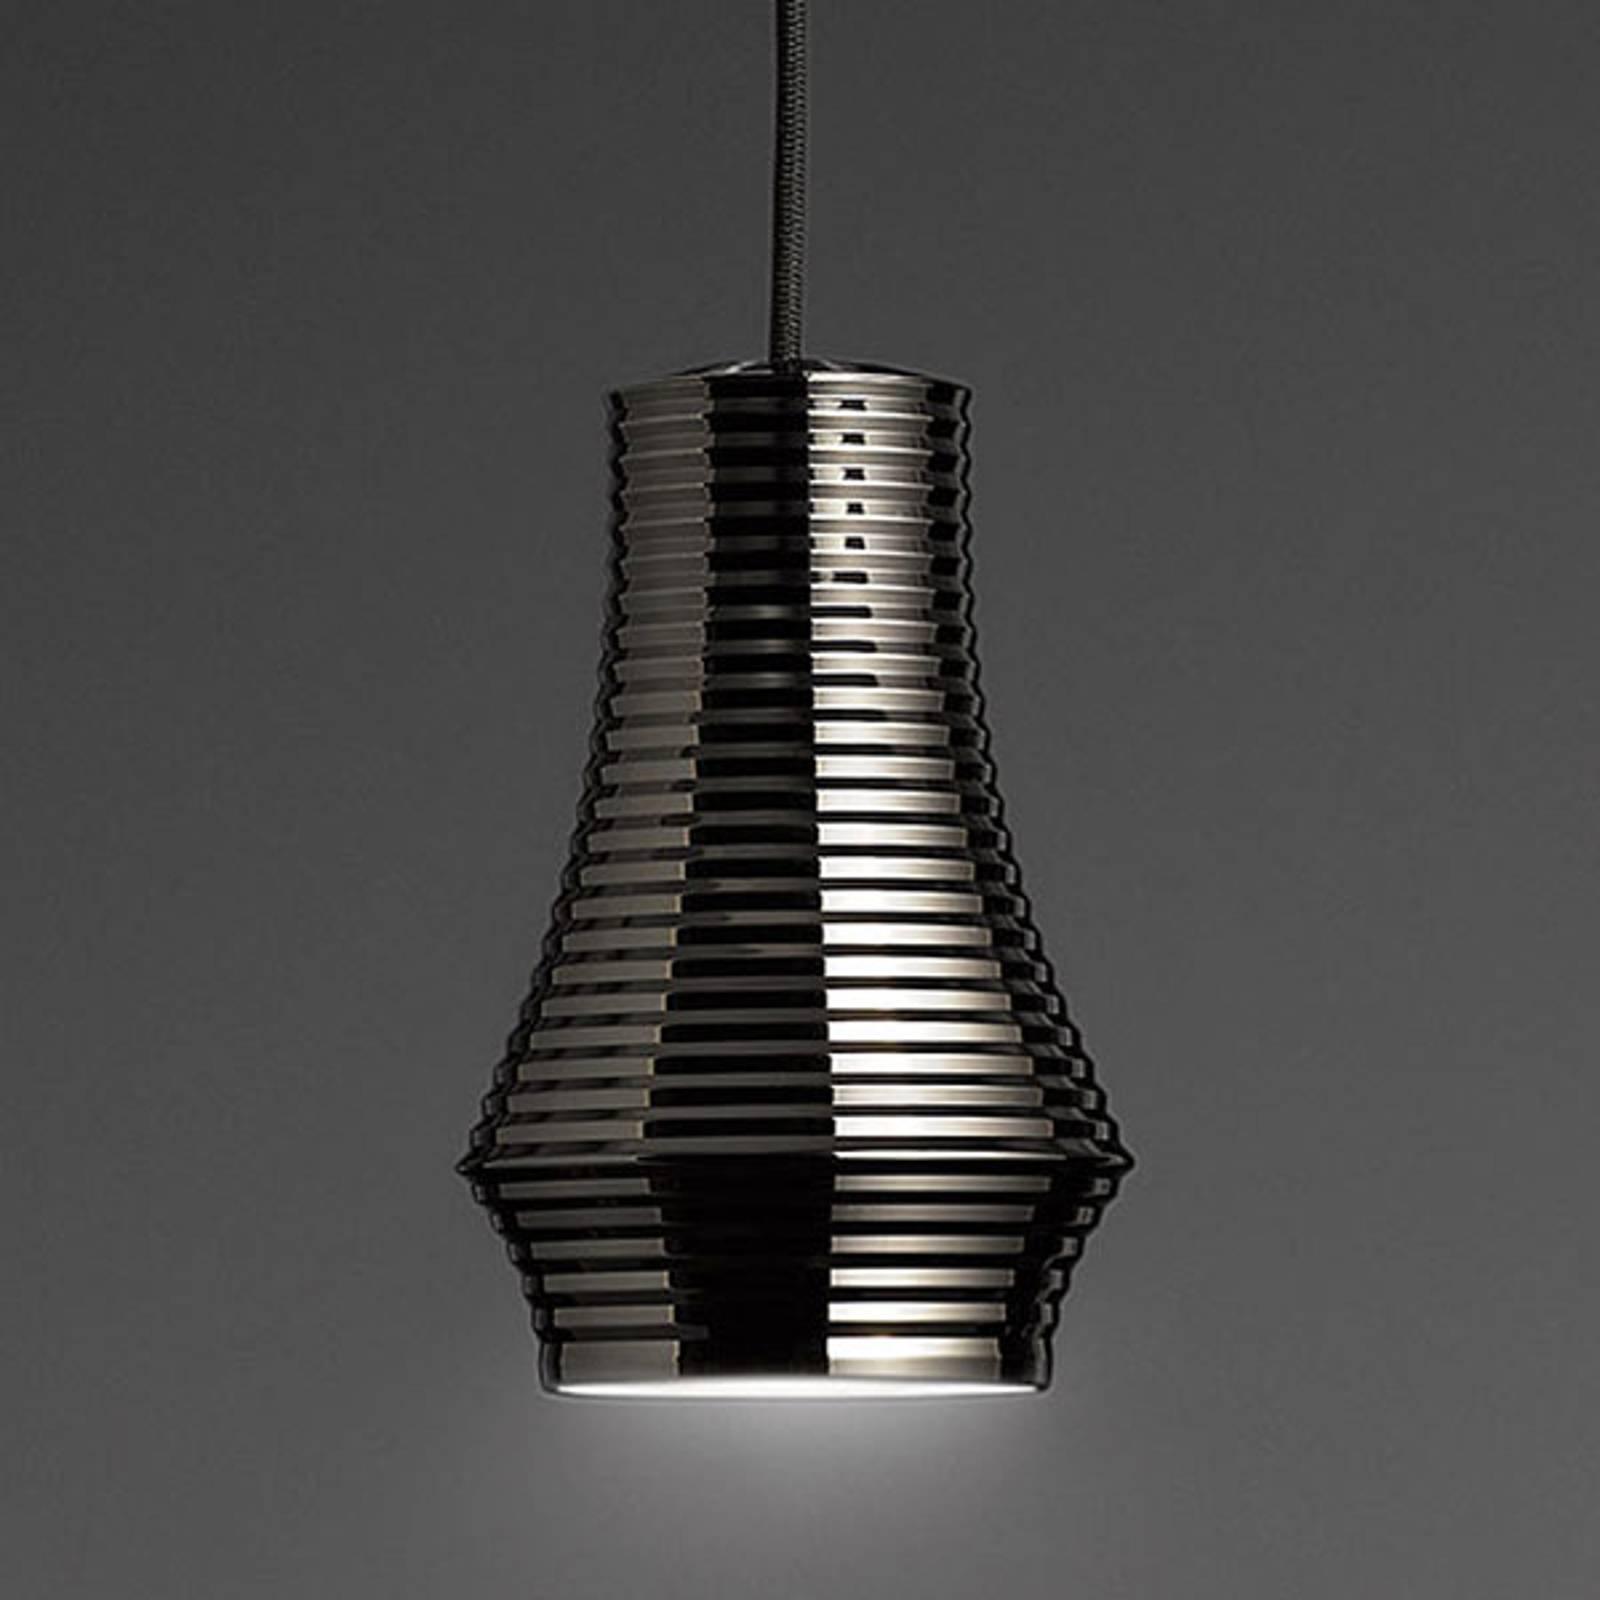 Bover Tibeta 01 - LED-riippuvalaisin, kromi-musta